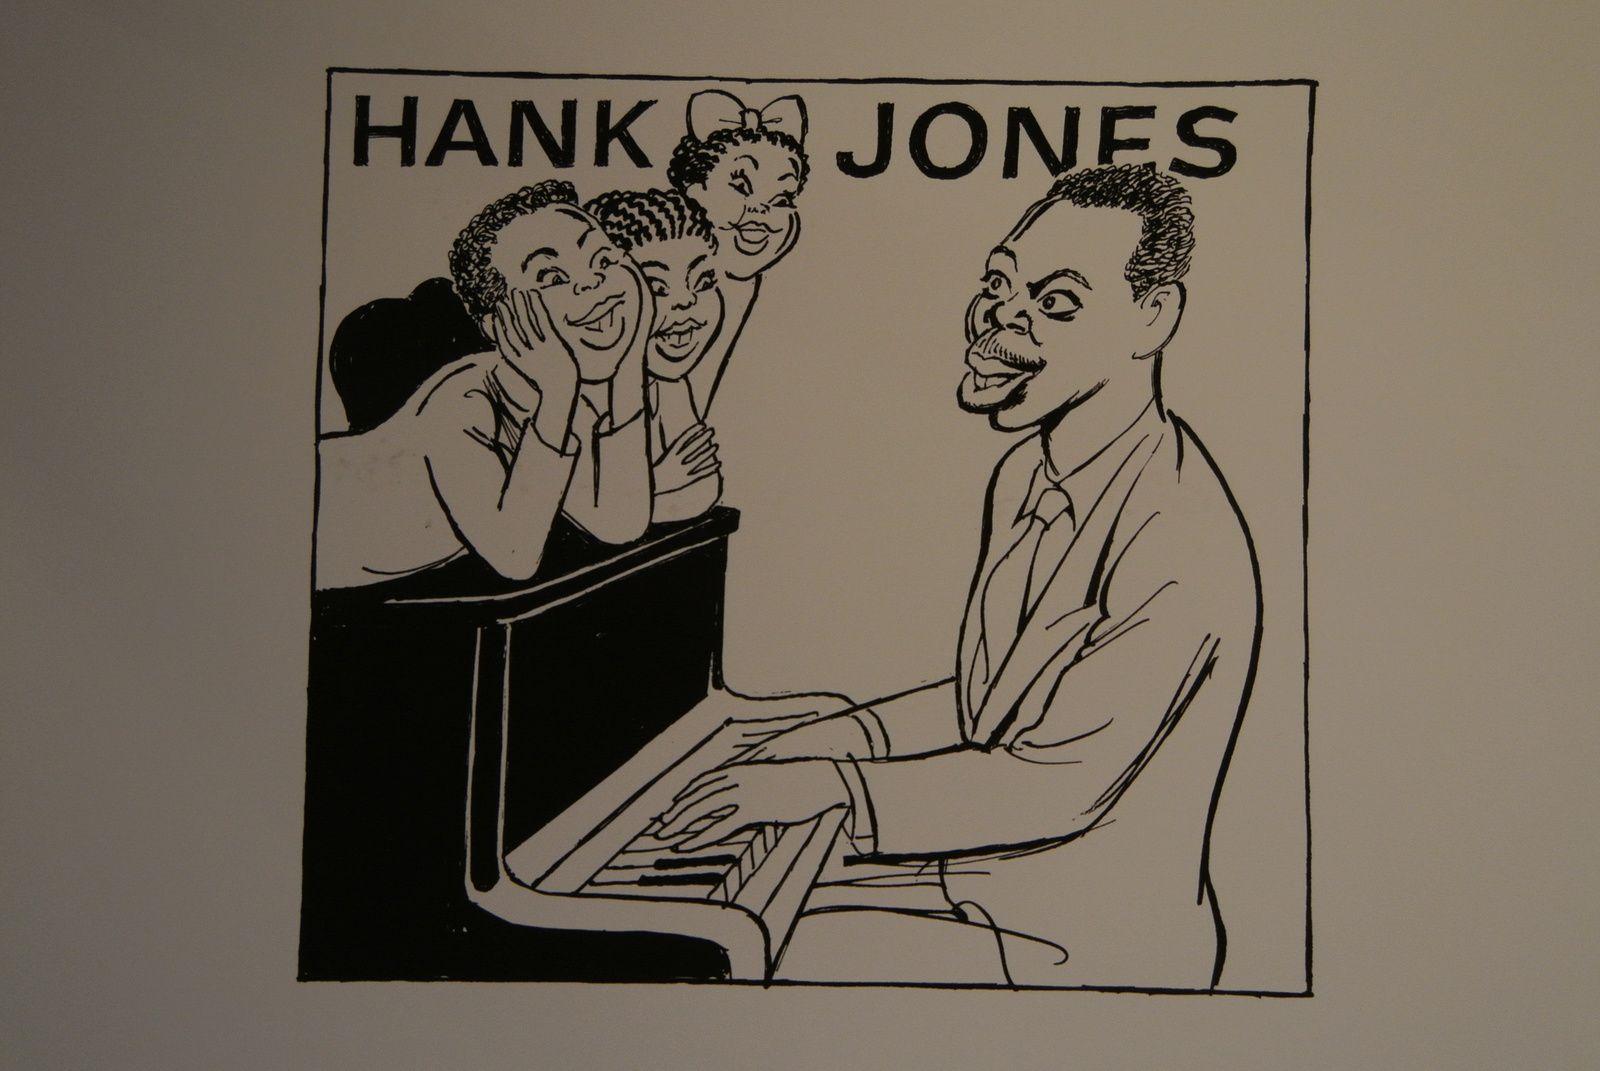 HANK JONES SELON CABU